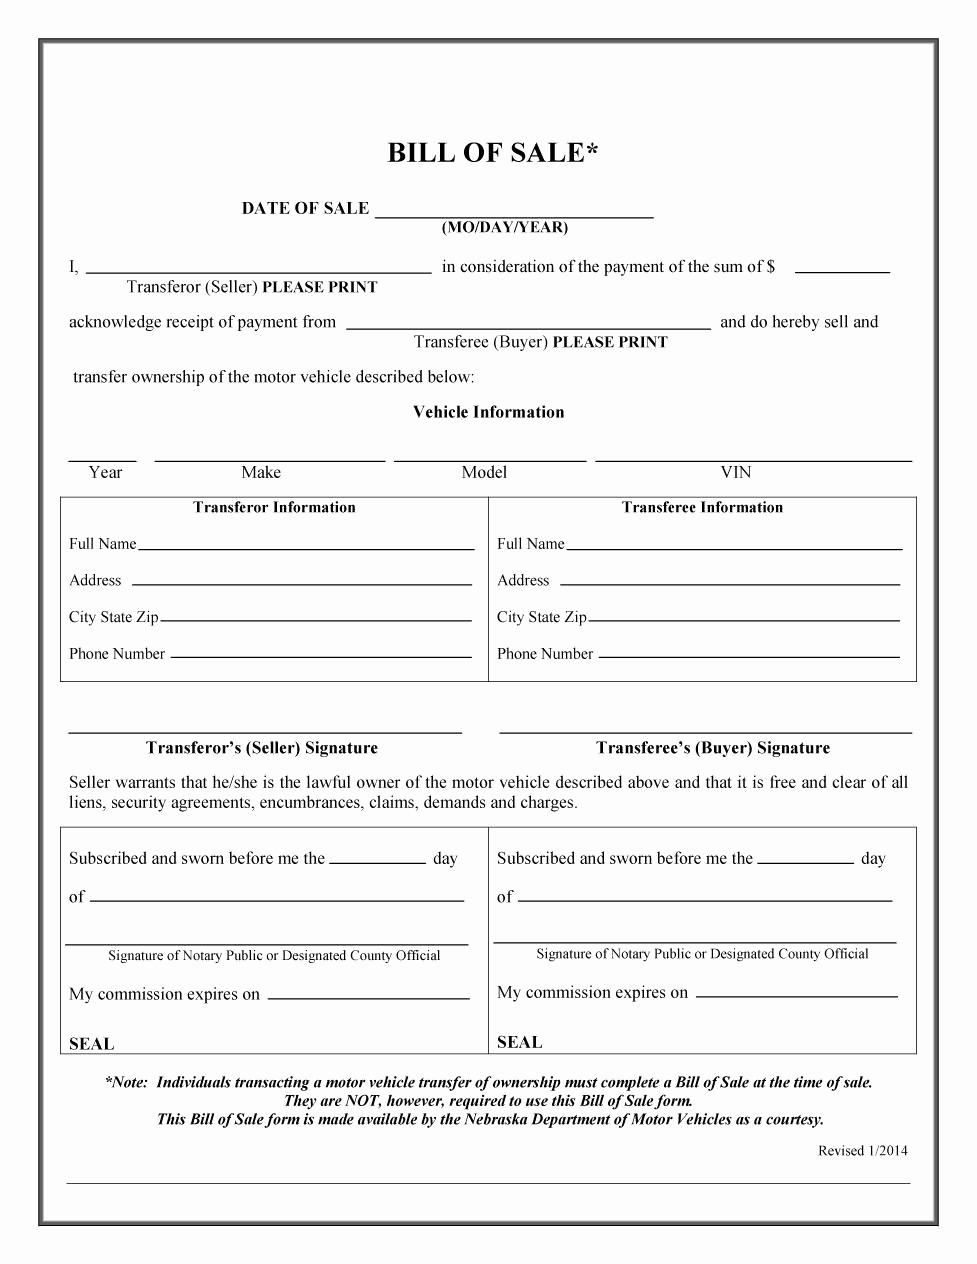 Bill Of Sale Template Download Elegant 45 Fee Printable Bill Of Sale Templates Car Boat Gun